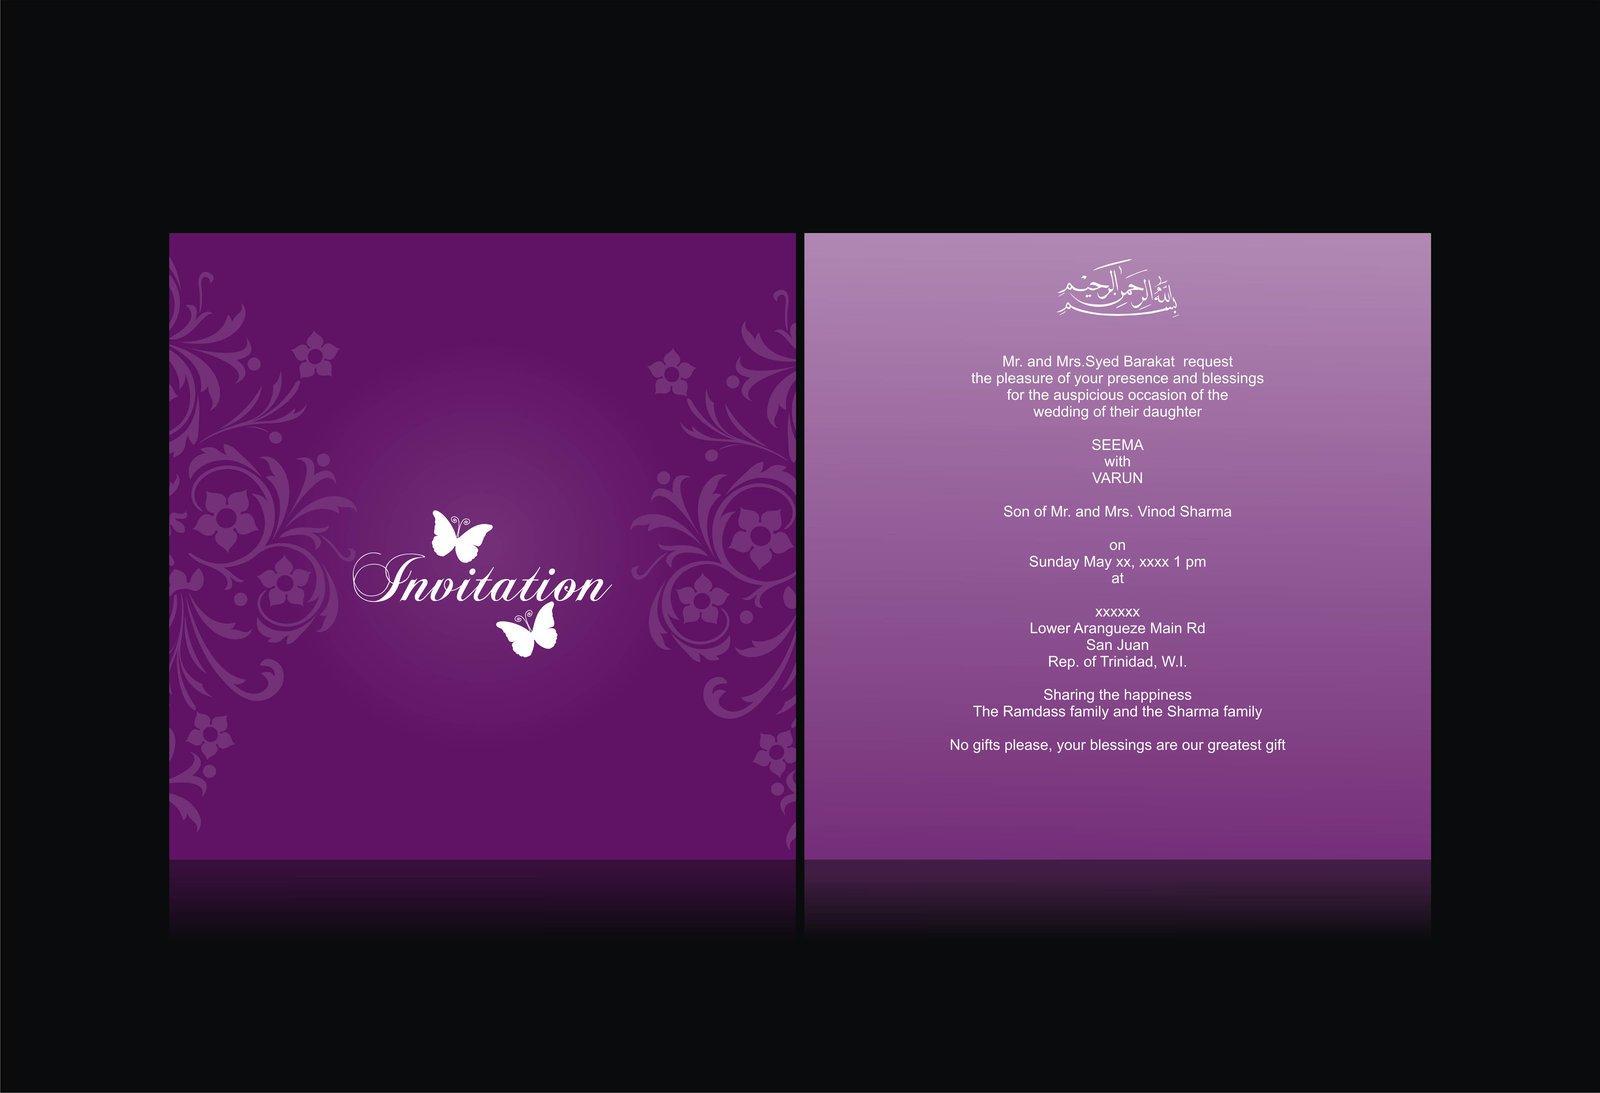 Wedding Invitation Card Design Template Free Download